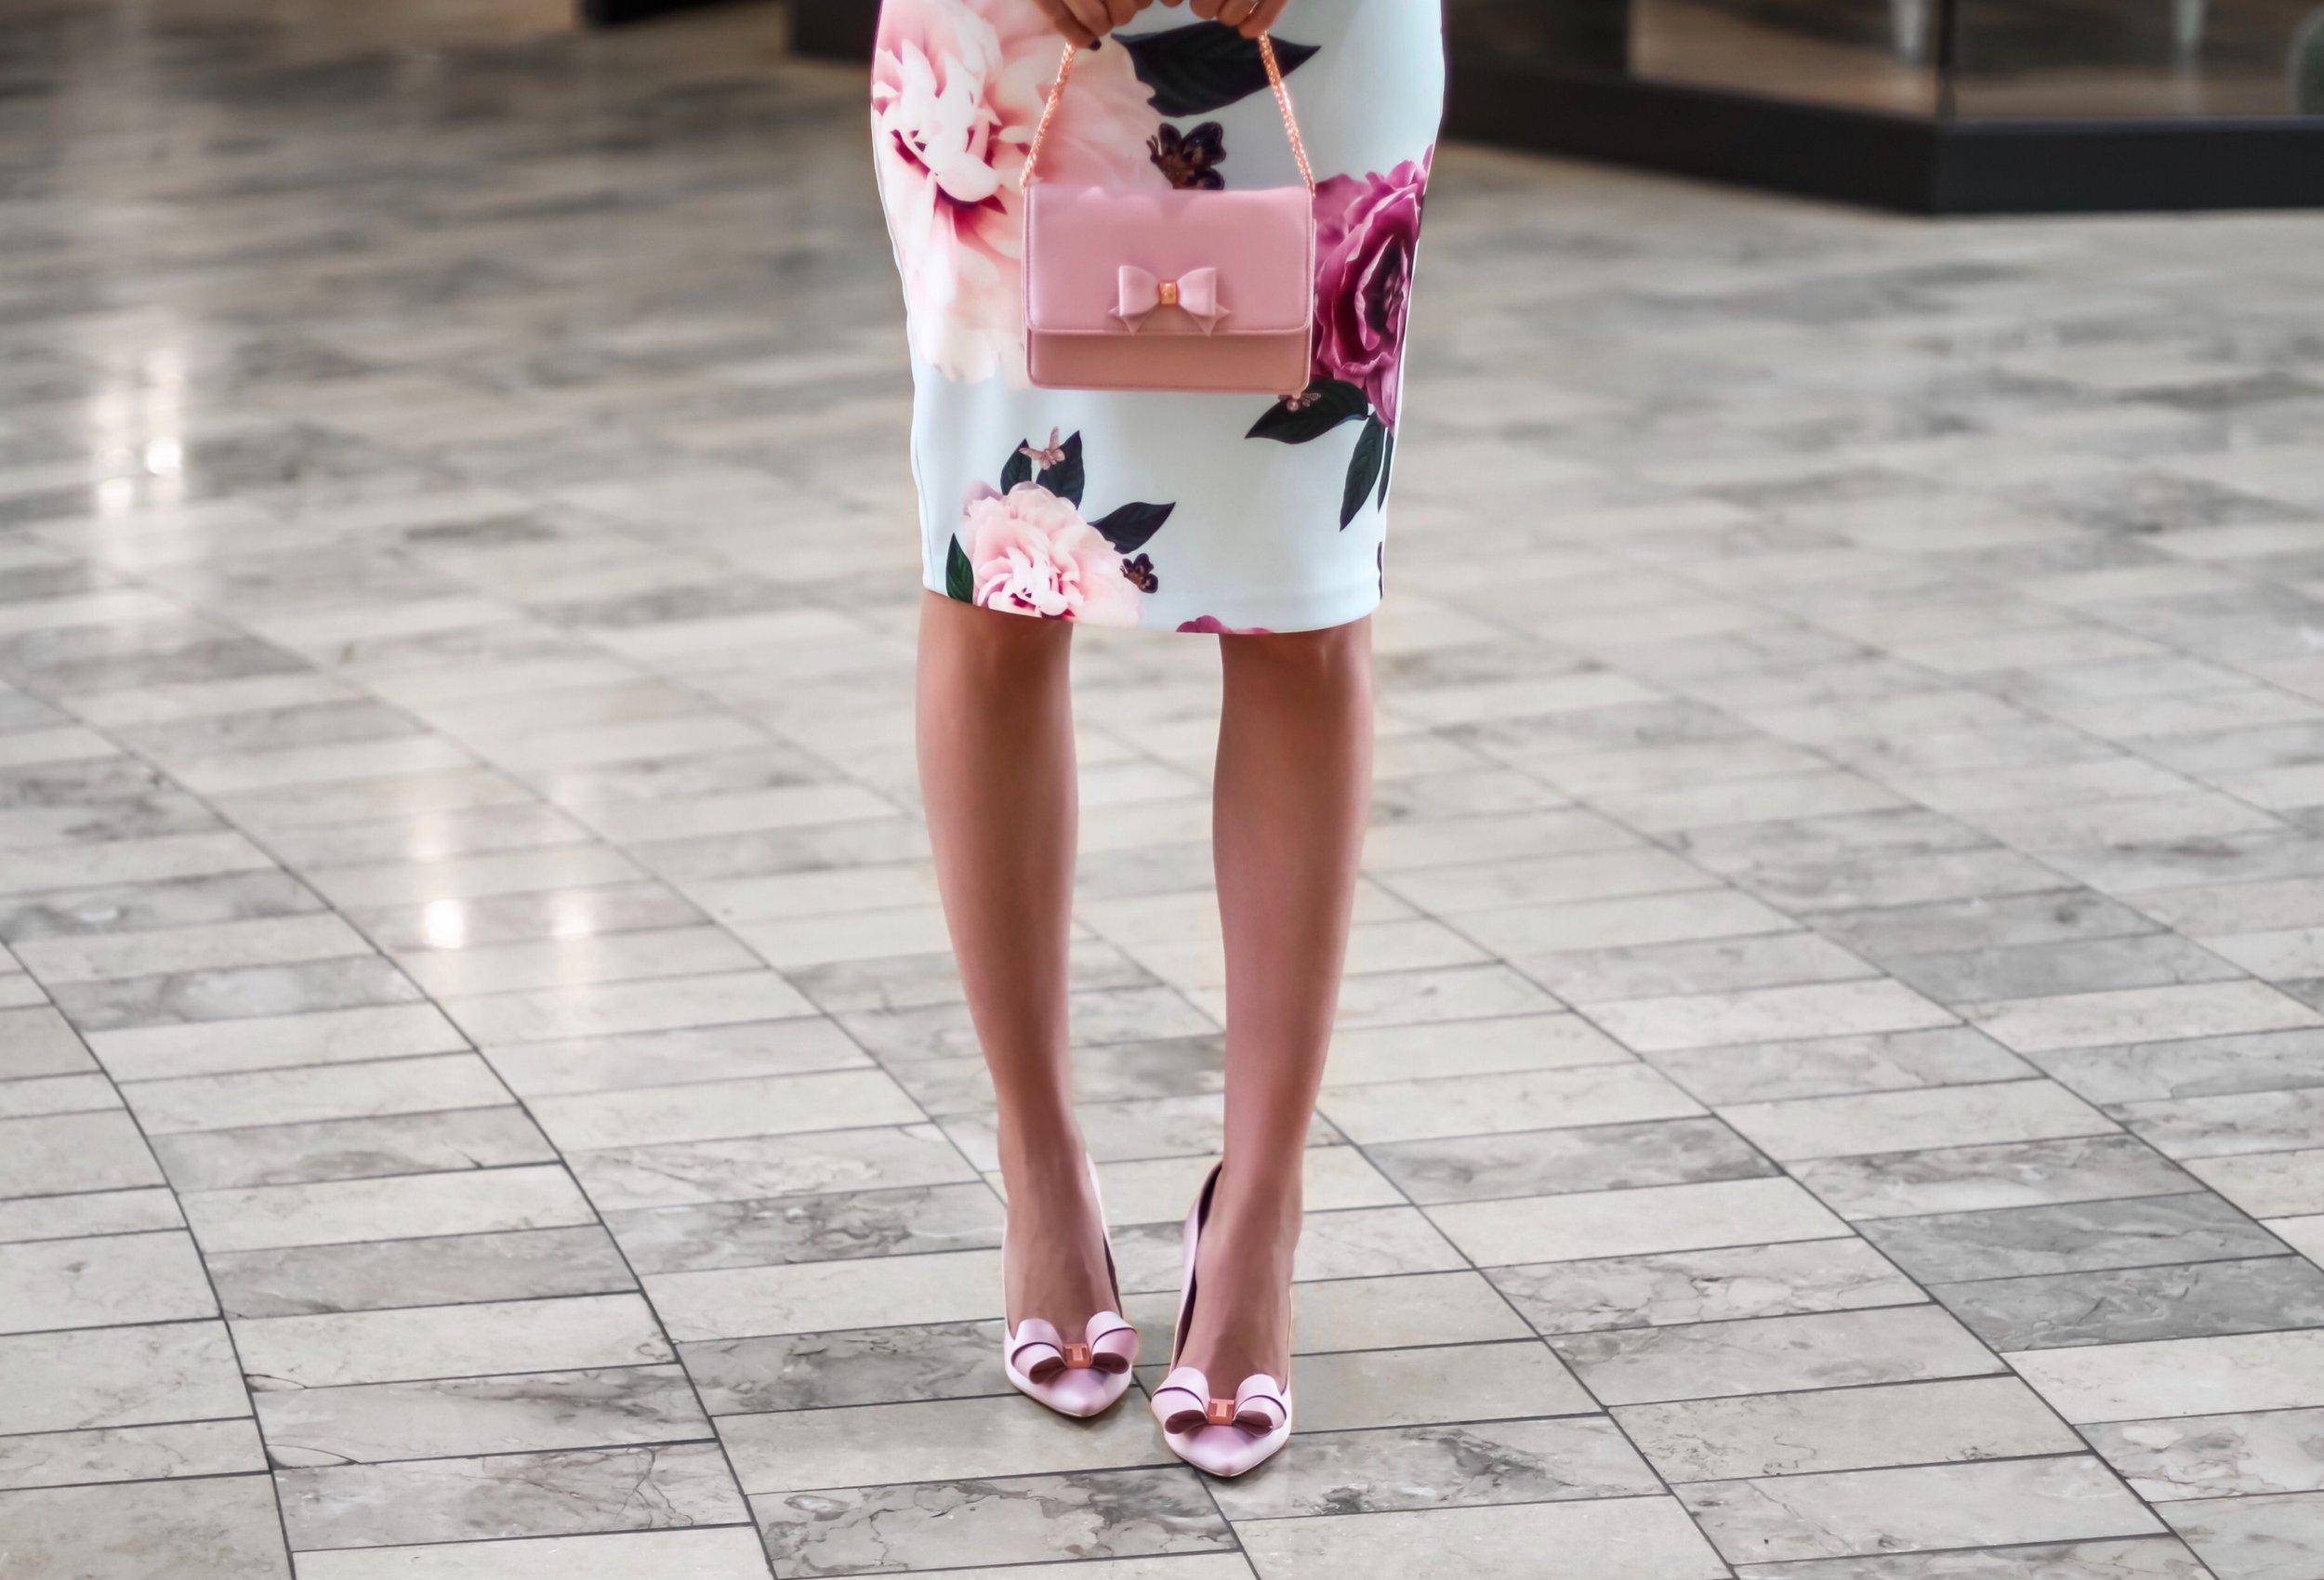 Ted-baker-eveelyn-looped-bow-evening-bag-light-pink-clutch.jpg